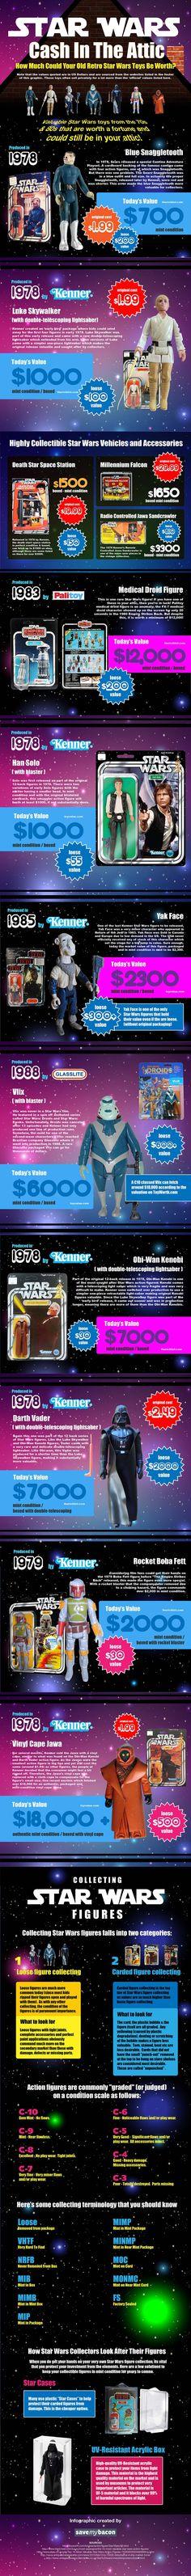 Star Wars Values